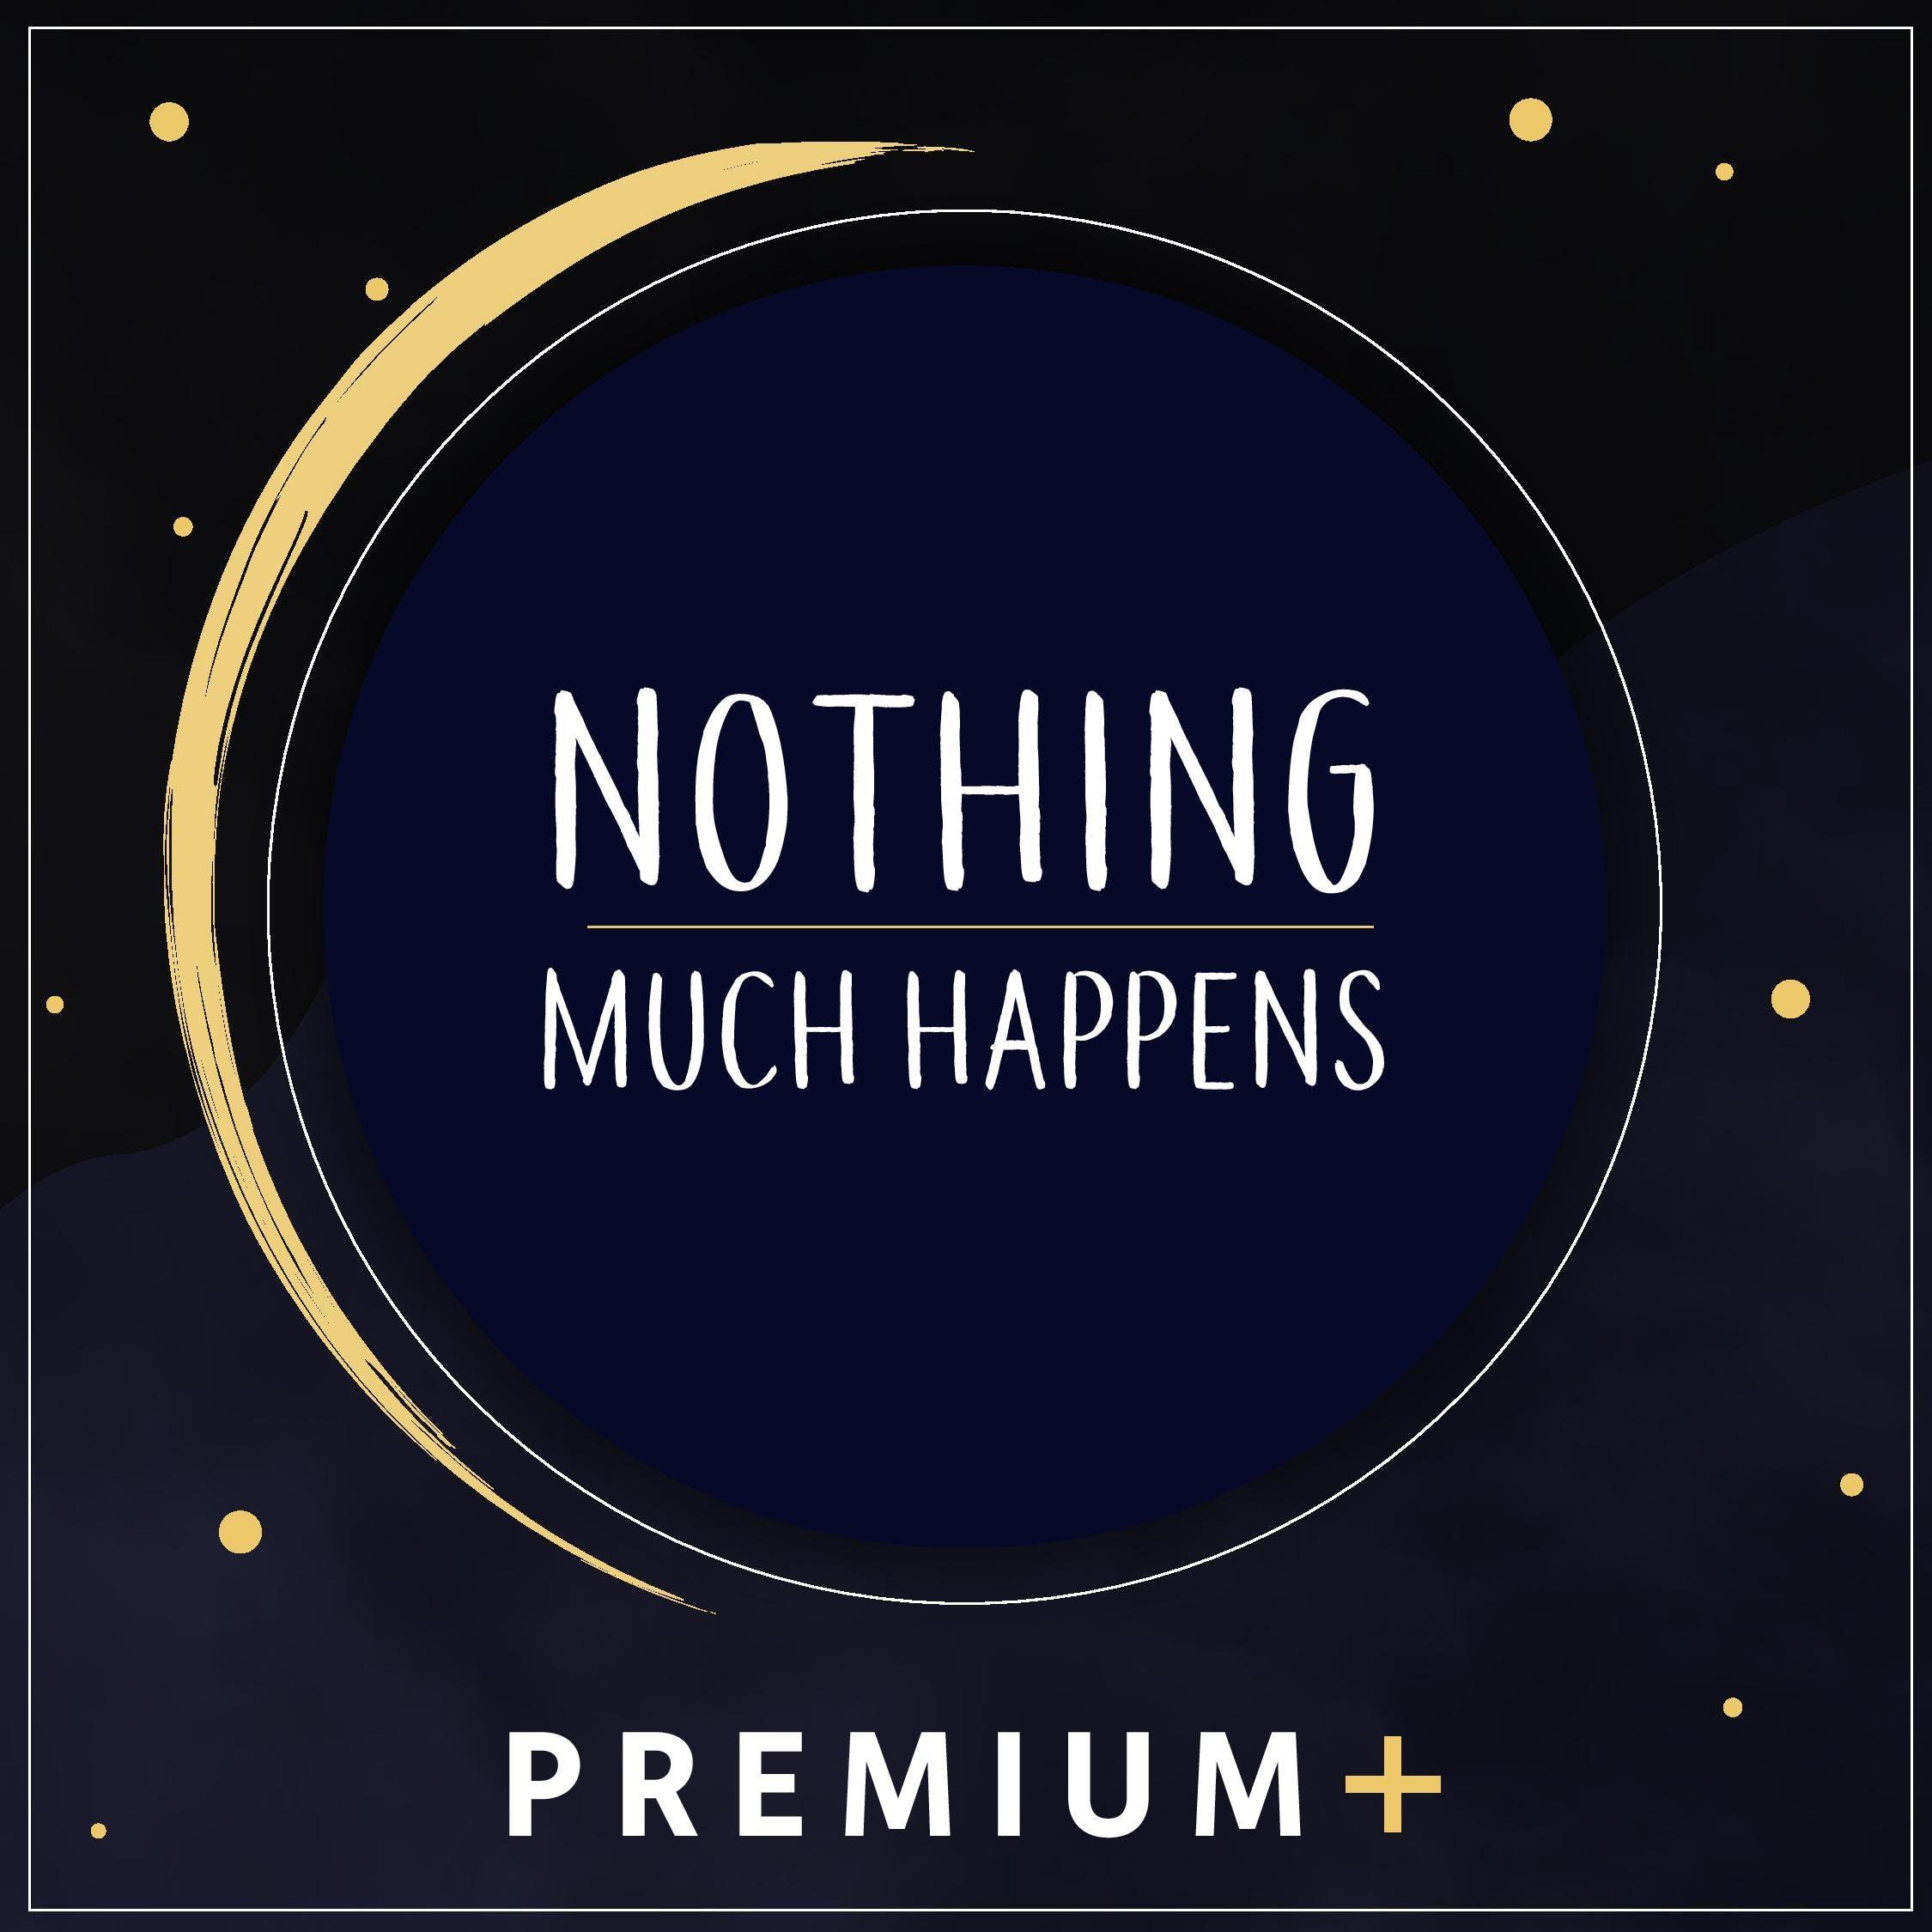 Nothing Much Happens Premium PLUS podcast tile